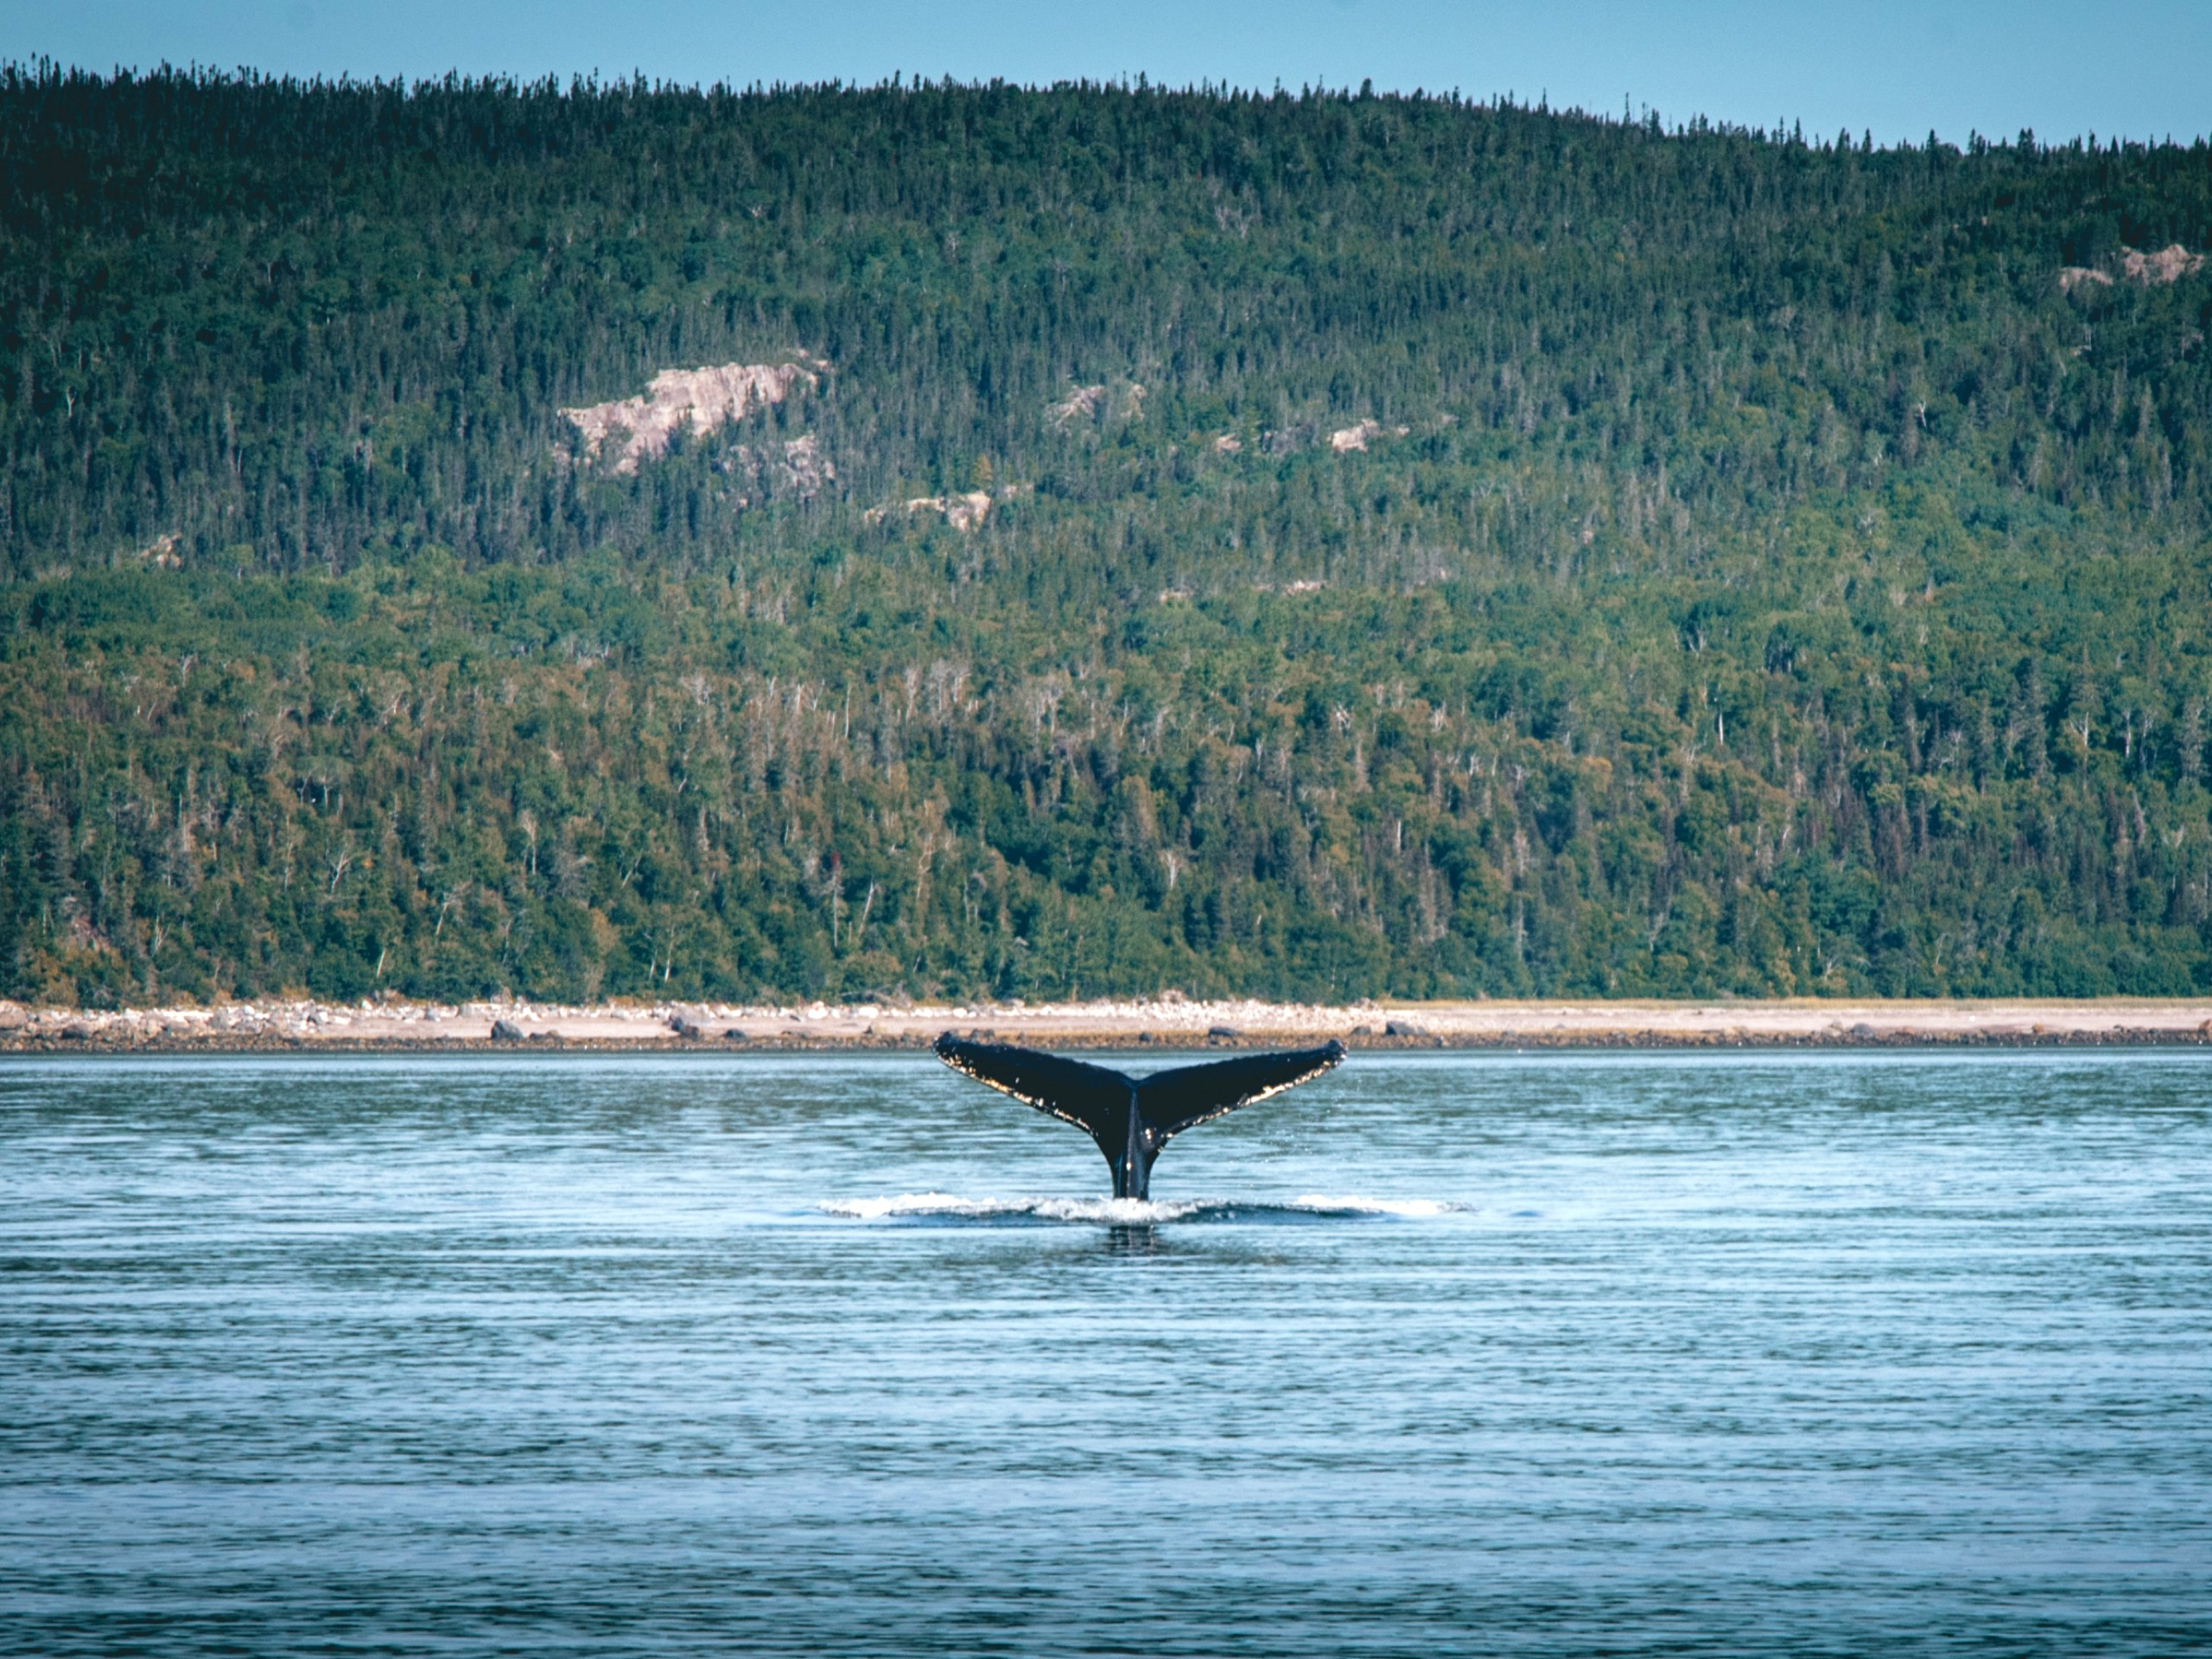 Whale at Tadoussac (Quebec)